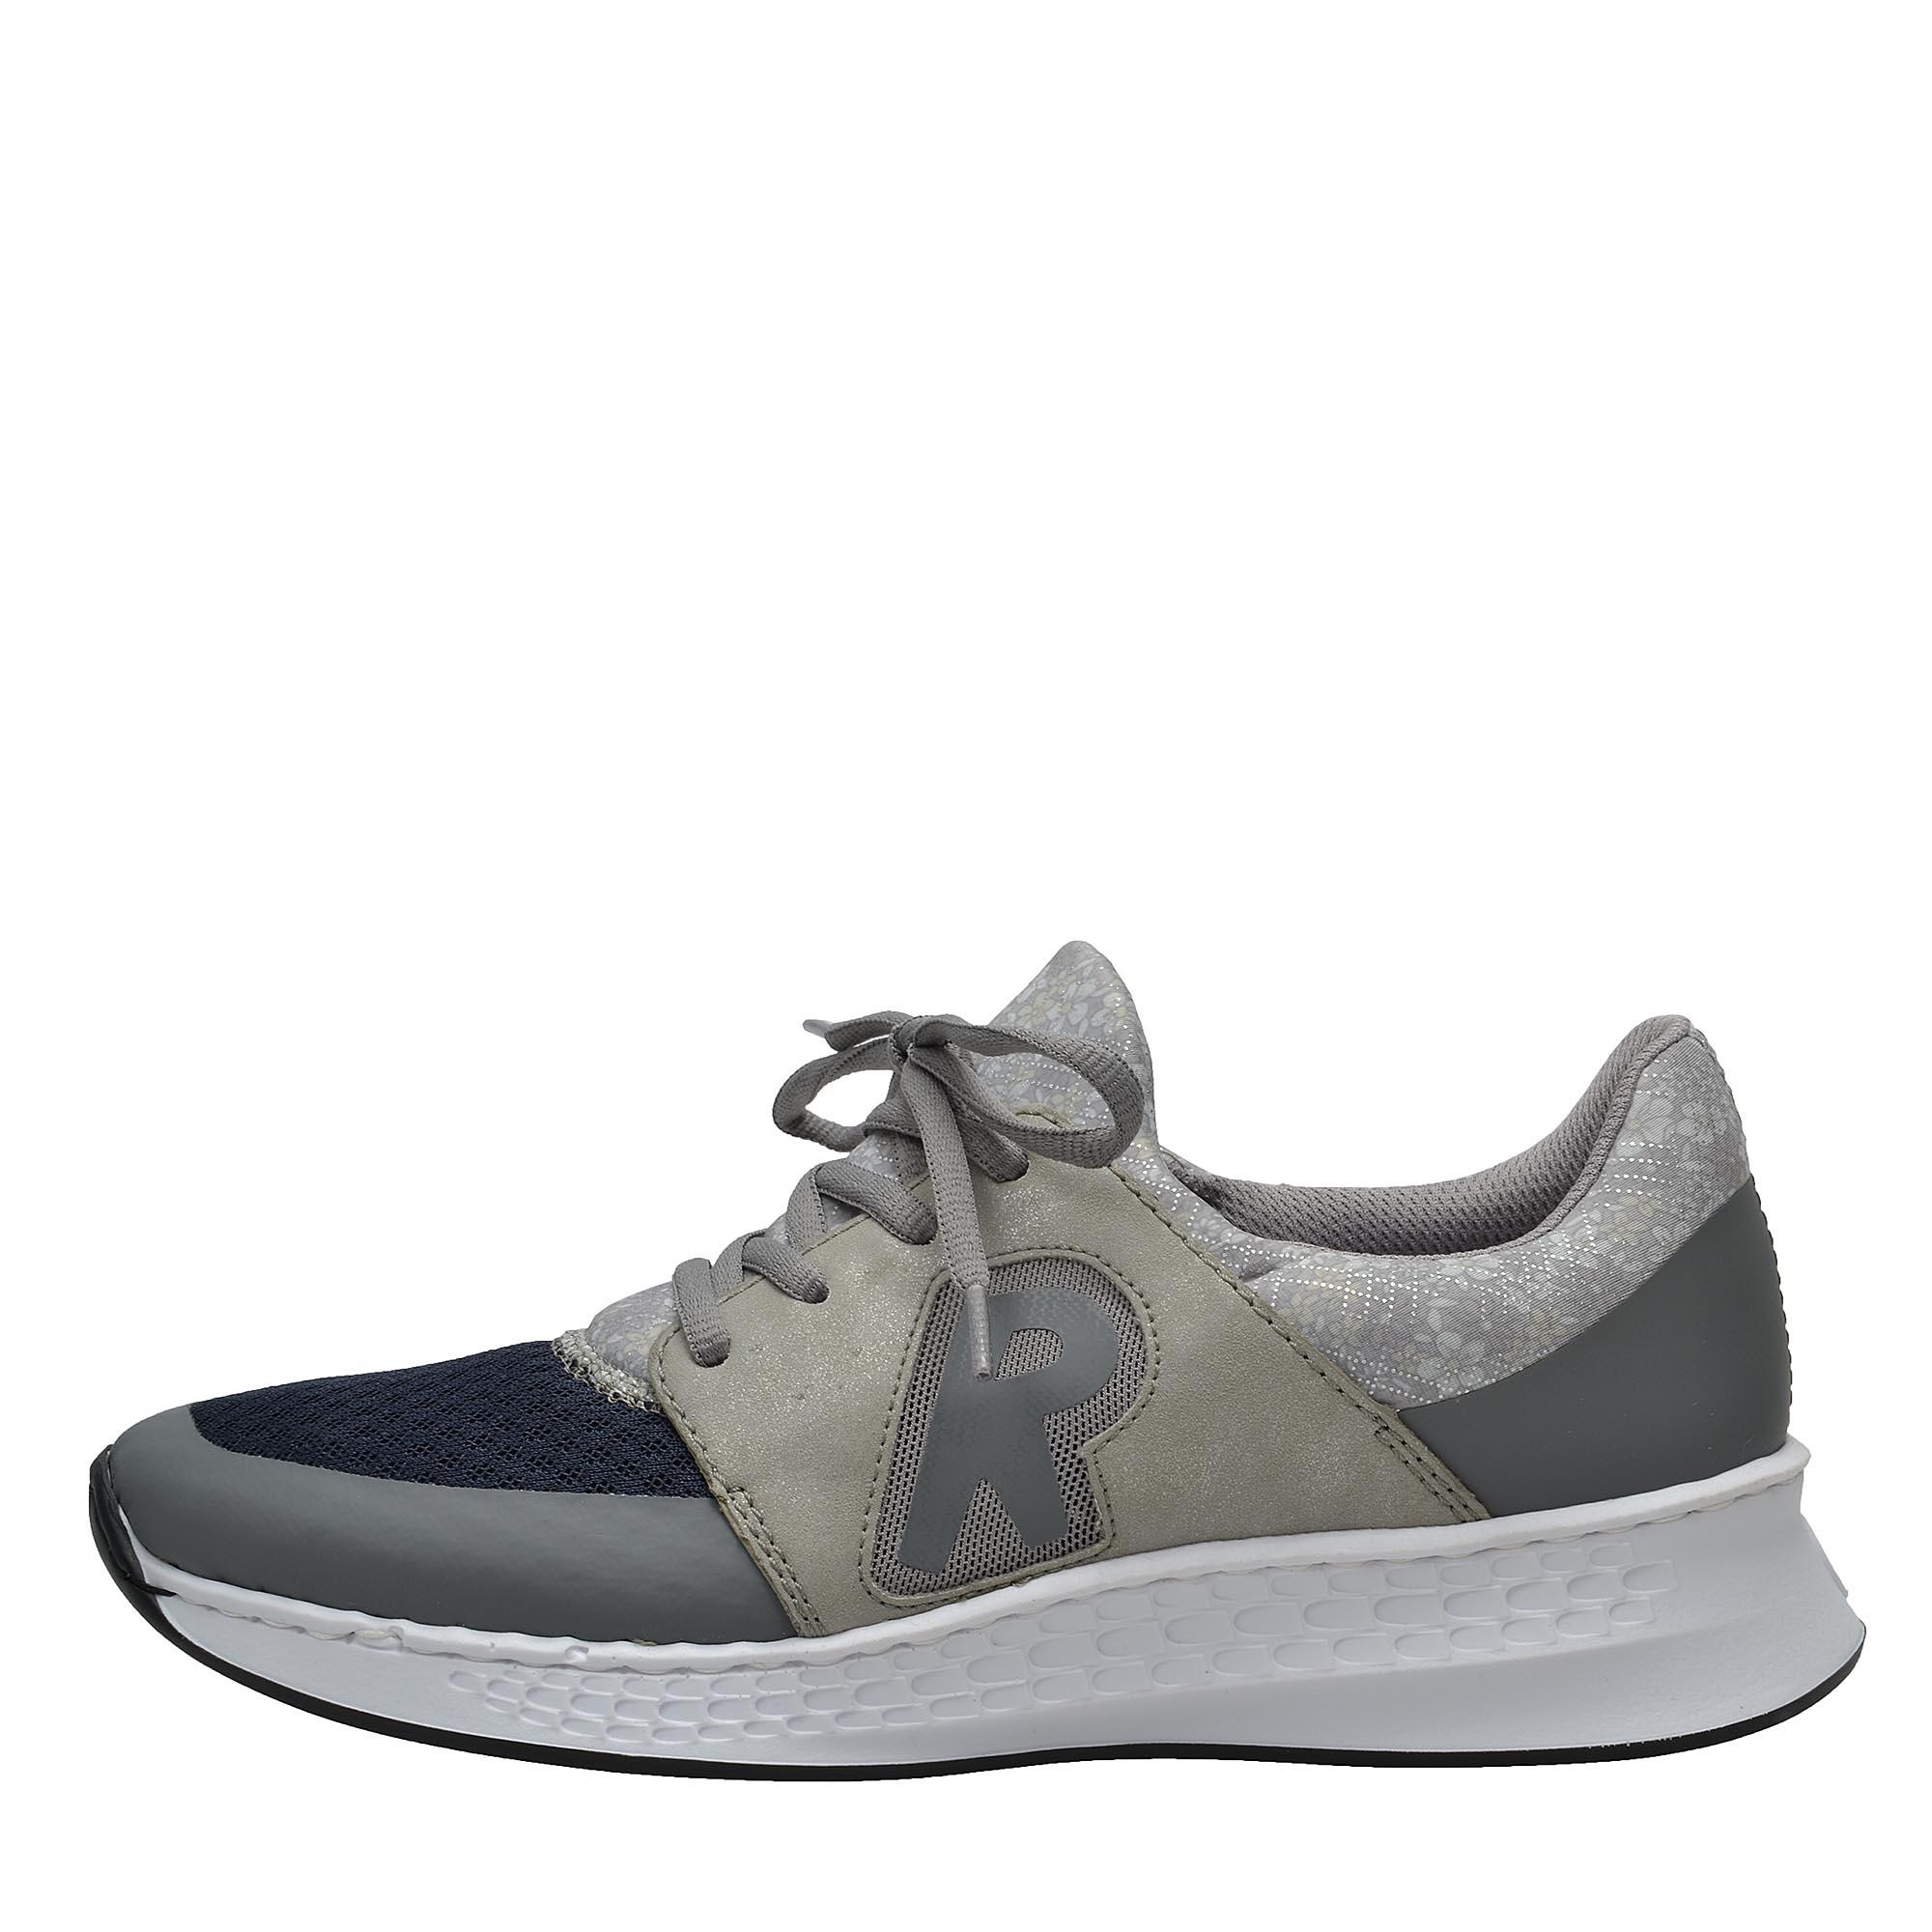 0fd8800f60 detail Dámská obuv RIEKER br N5611 42 GRAU F S 8